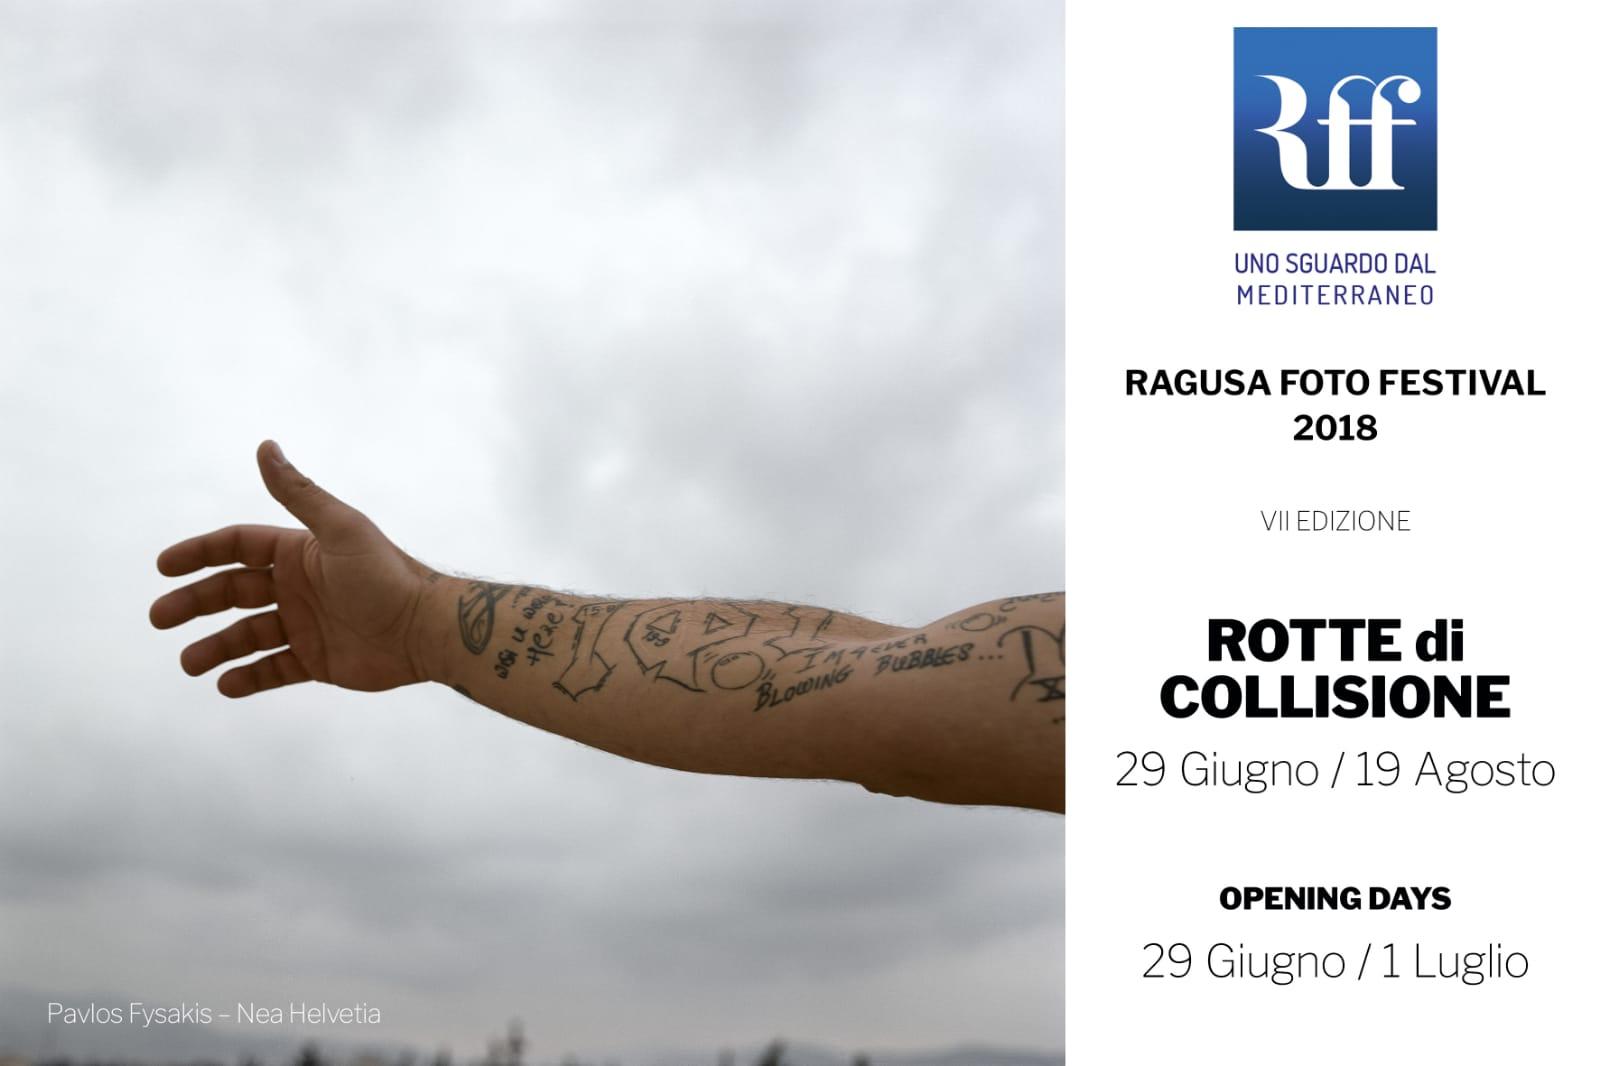 ragusa foto festival 2018